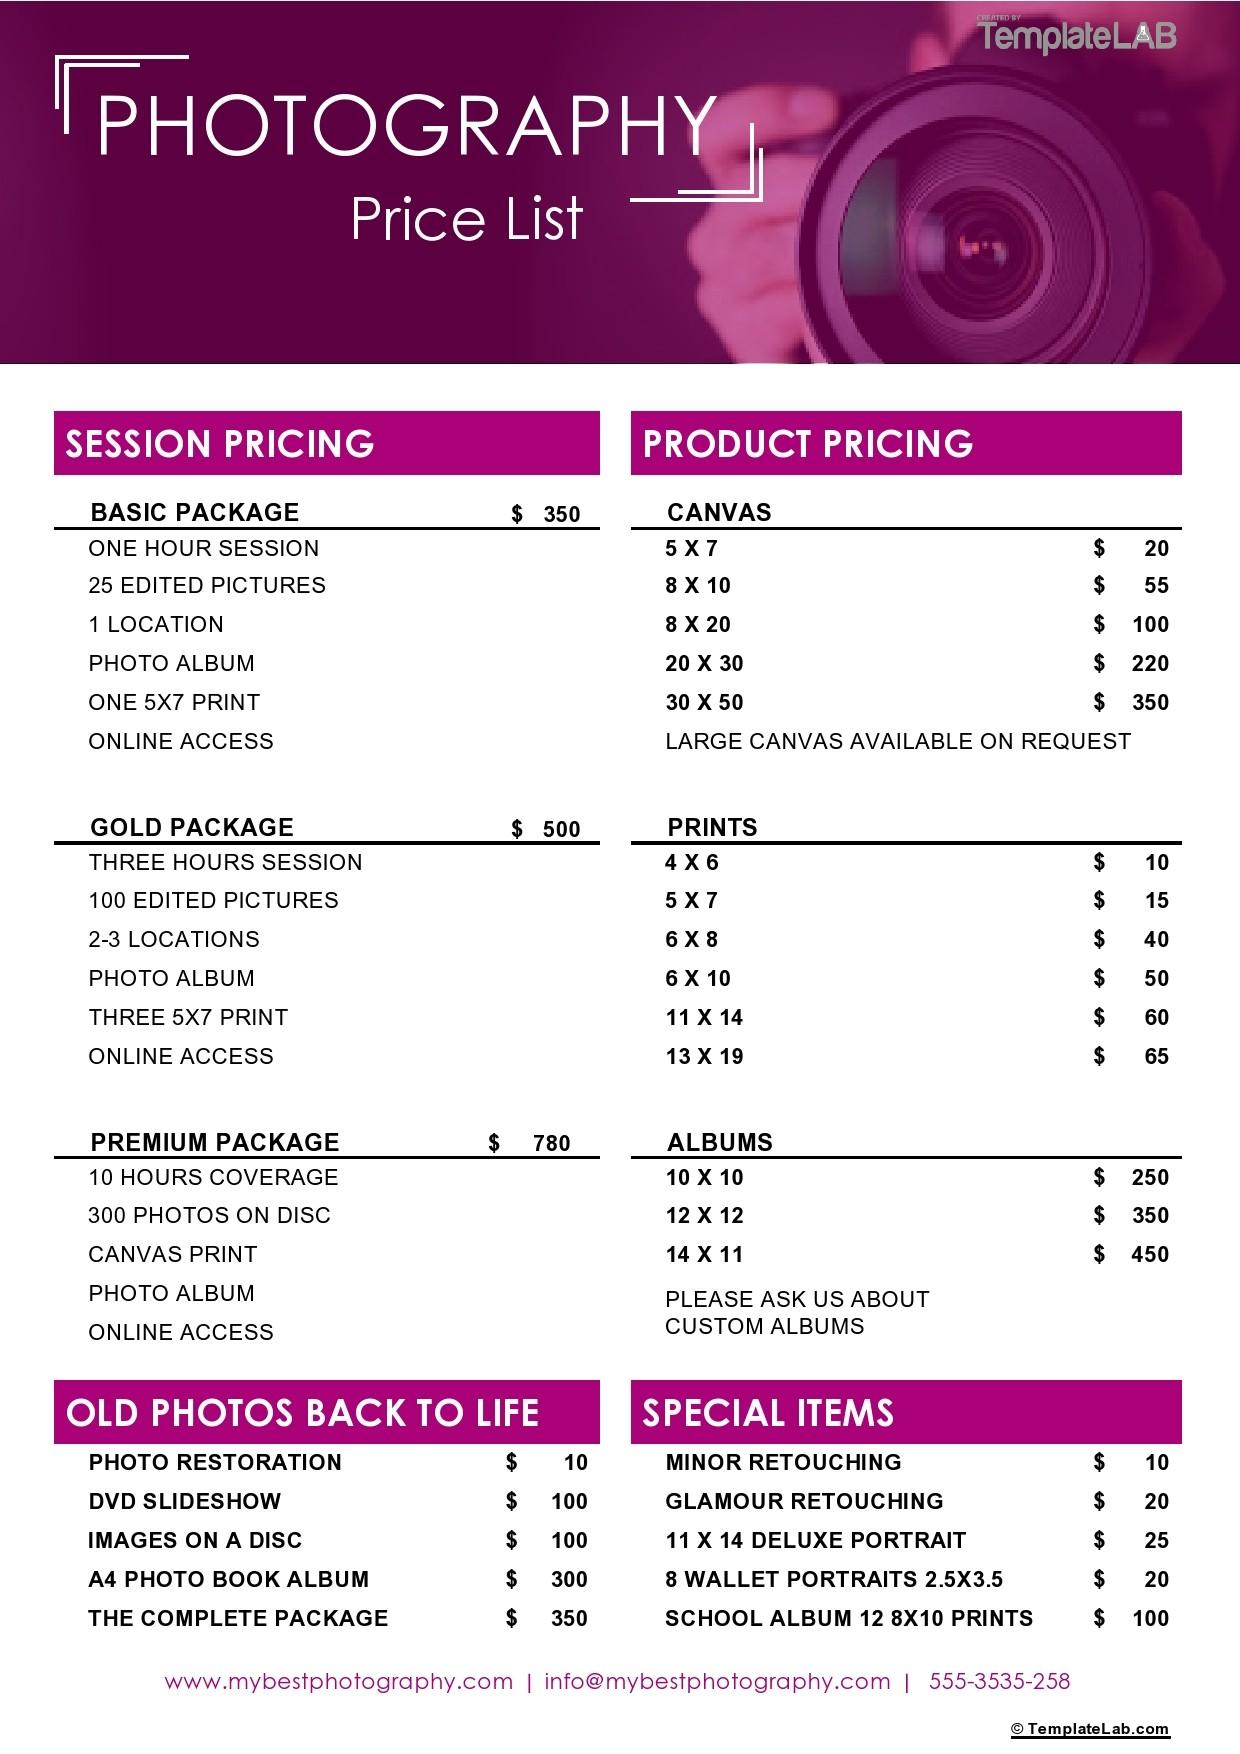 Free Photography Price List Template - TemplateLab.com